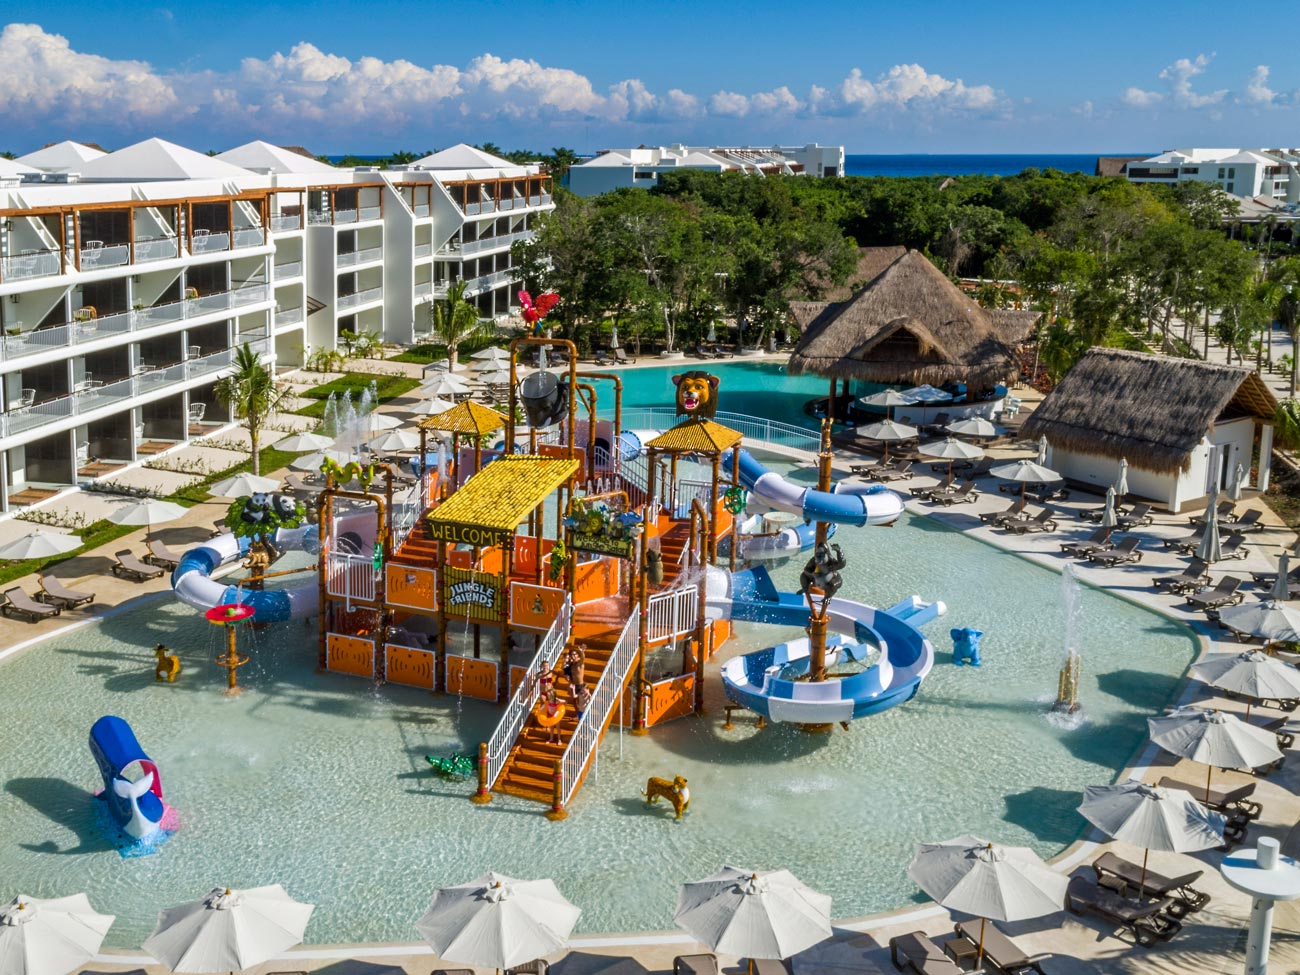 Ocean Riviera Paradise Riviera Maya Hotel Ocean Riviera Paradise Gallery